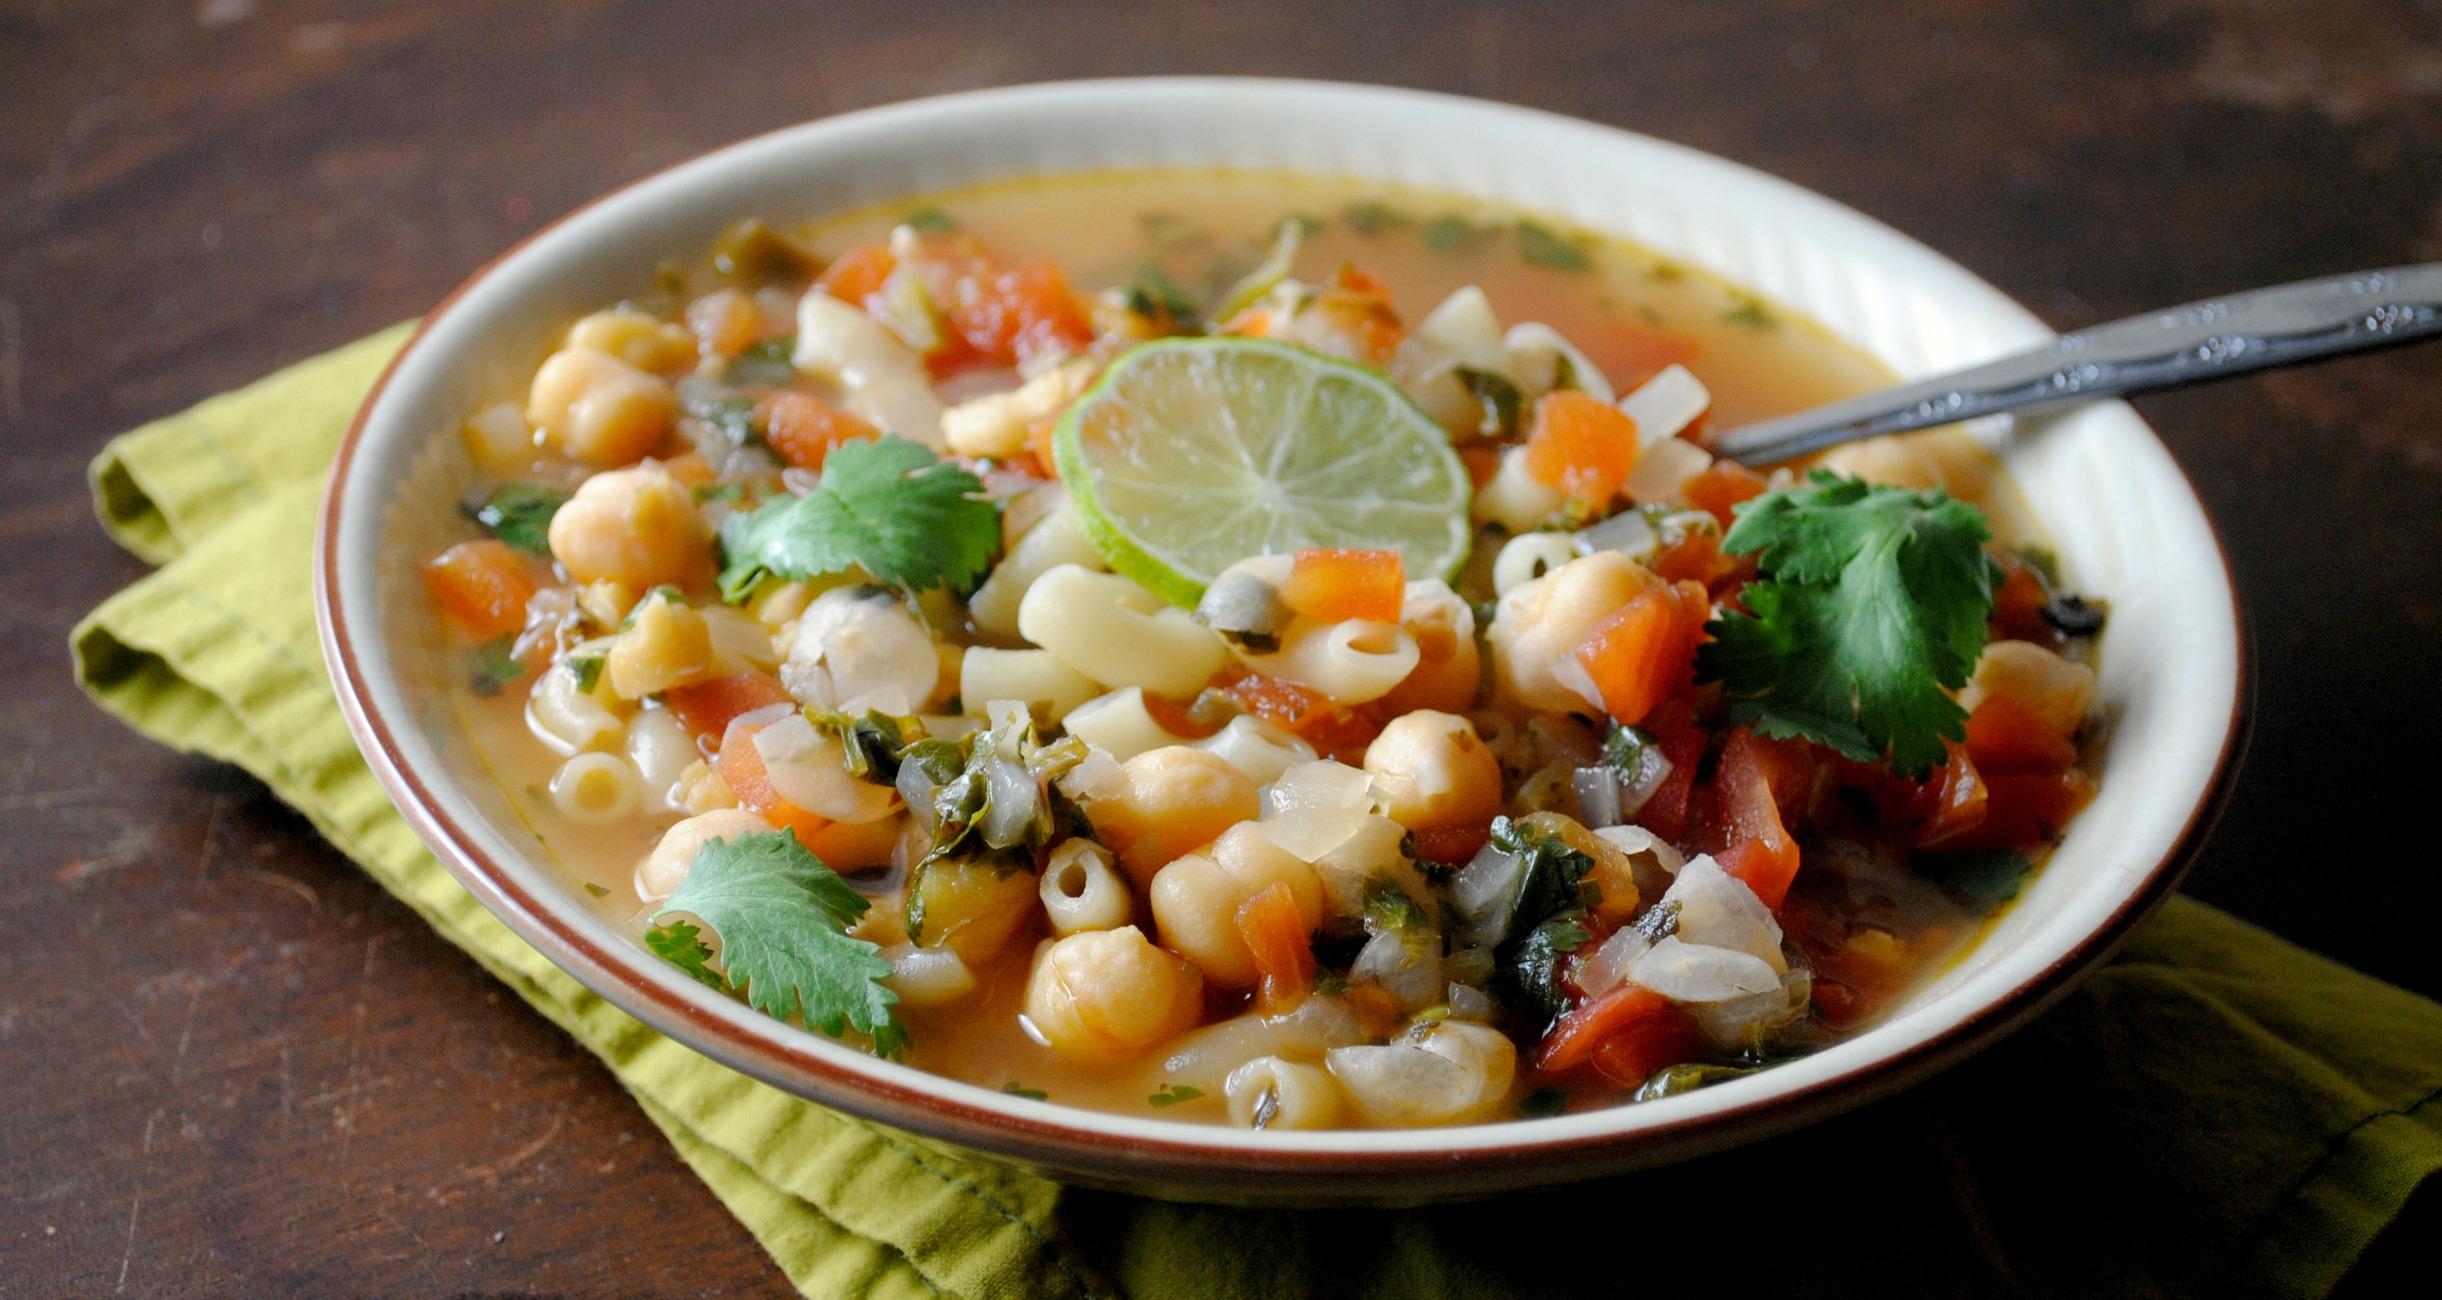 garbanzo-soup-VianneyRodriguez-sweetlifebake